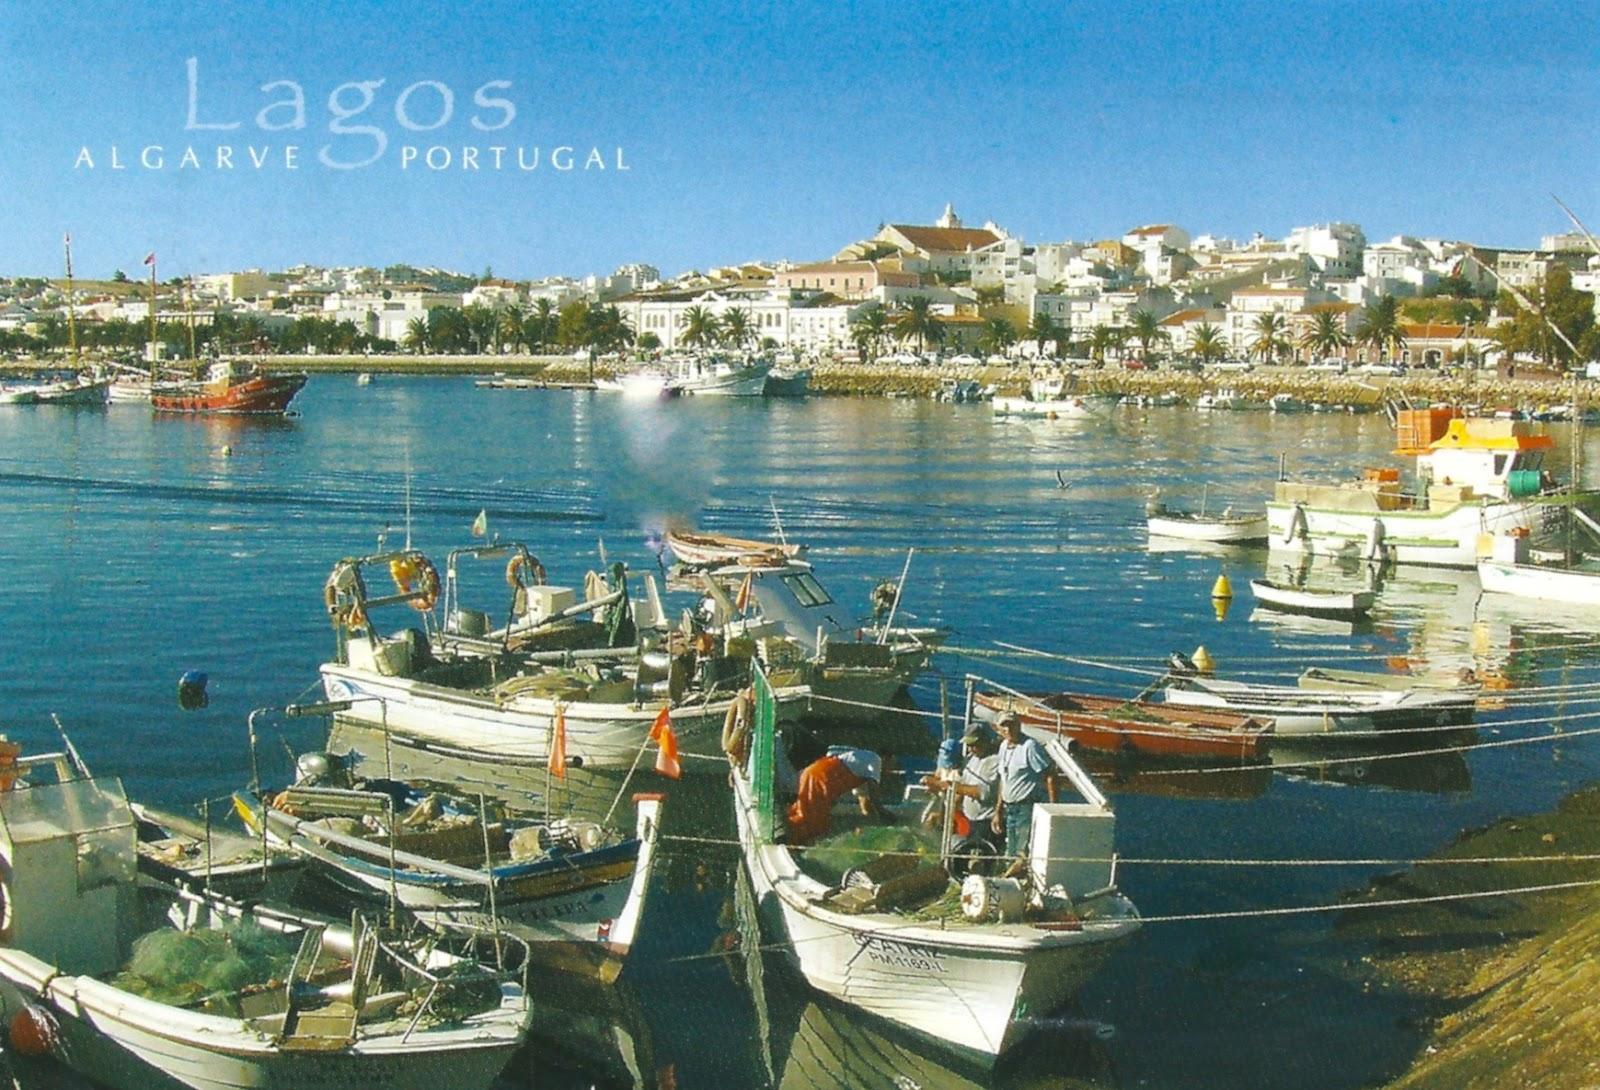 My favorite views lagos algarve portugal